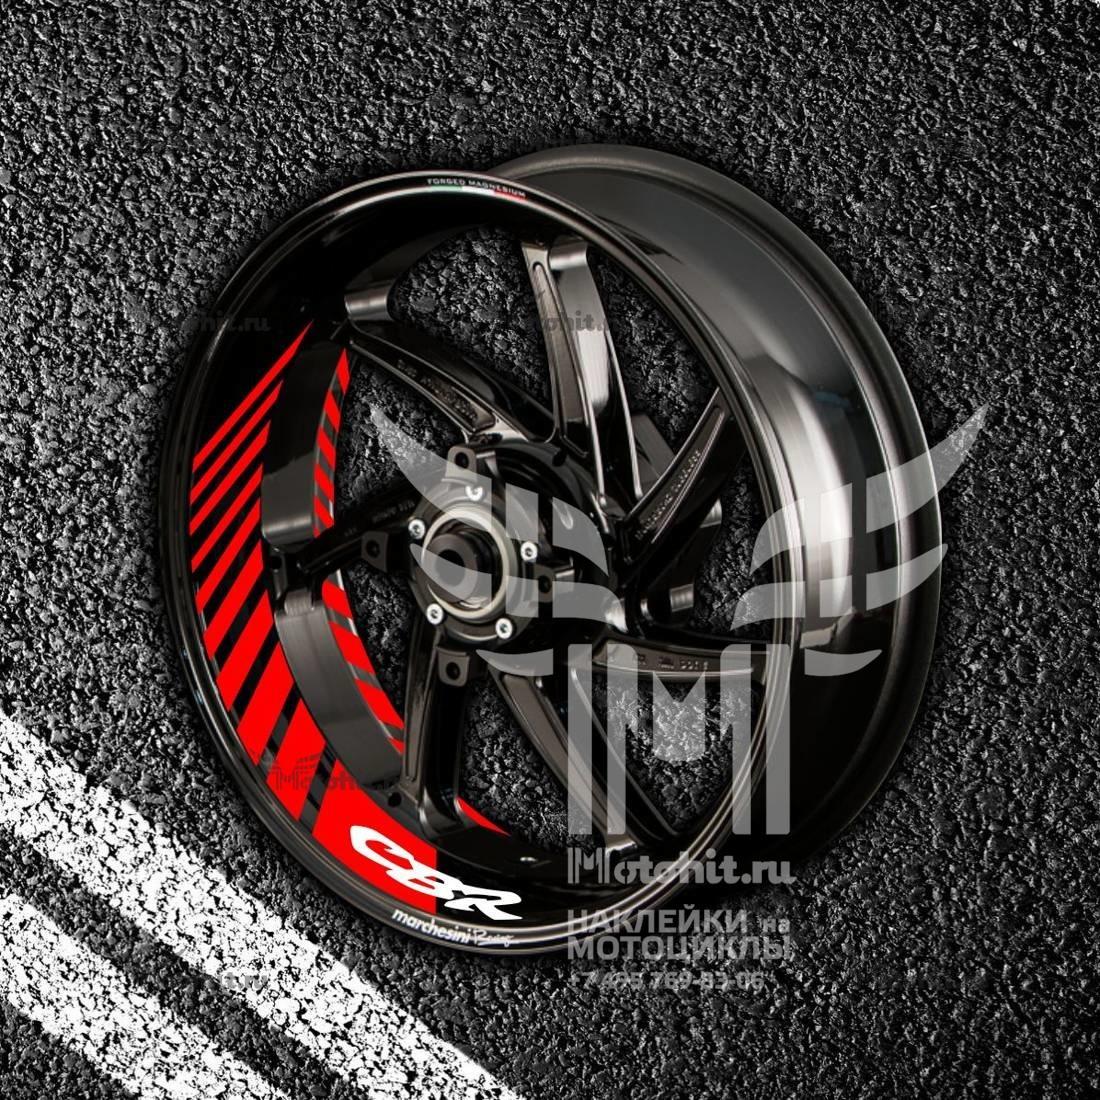 Комплект наклеек с полосами на колеса мотоцикла HONDA CBR-2